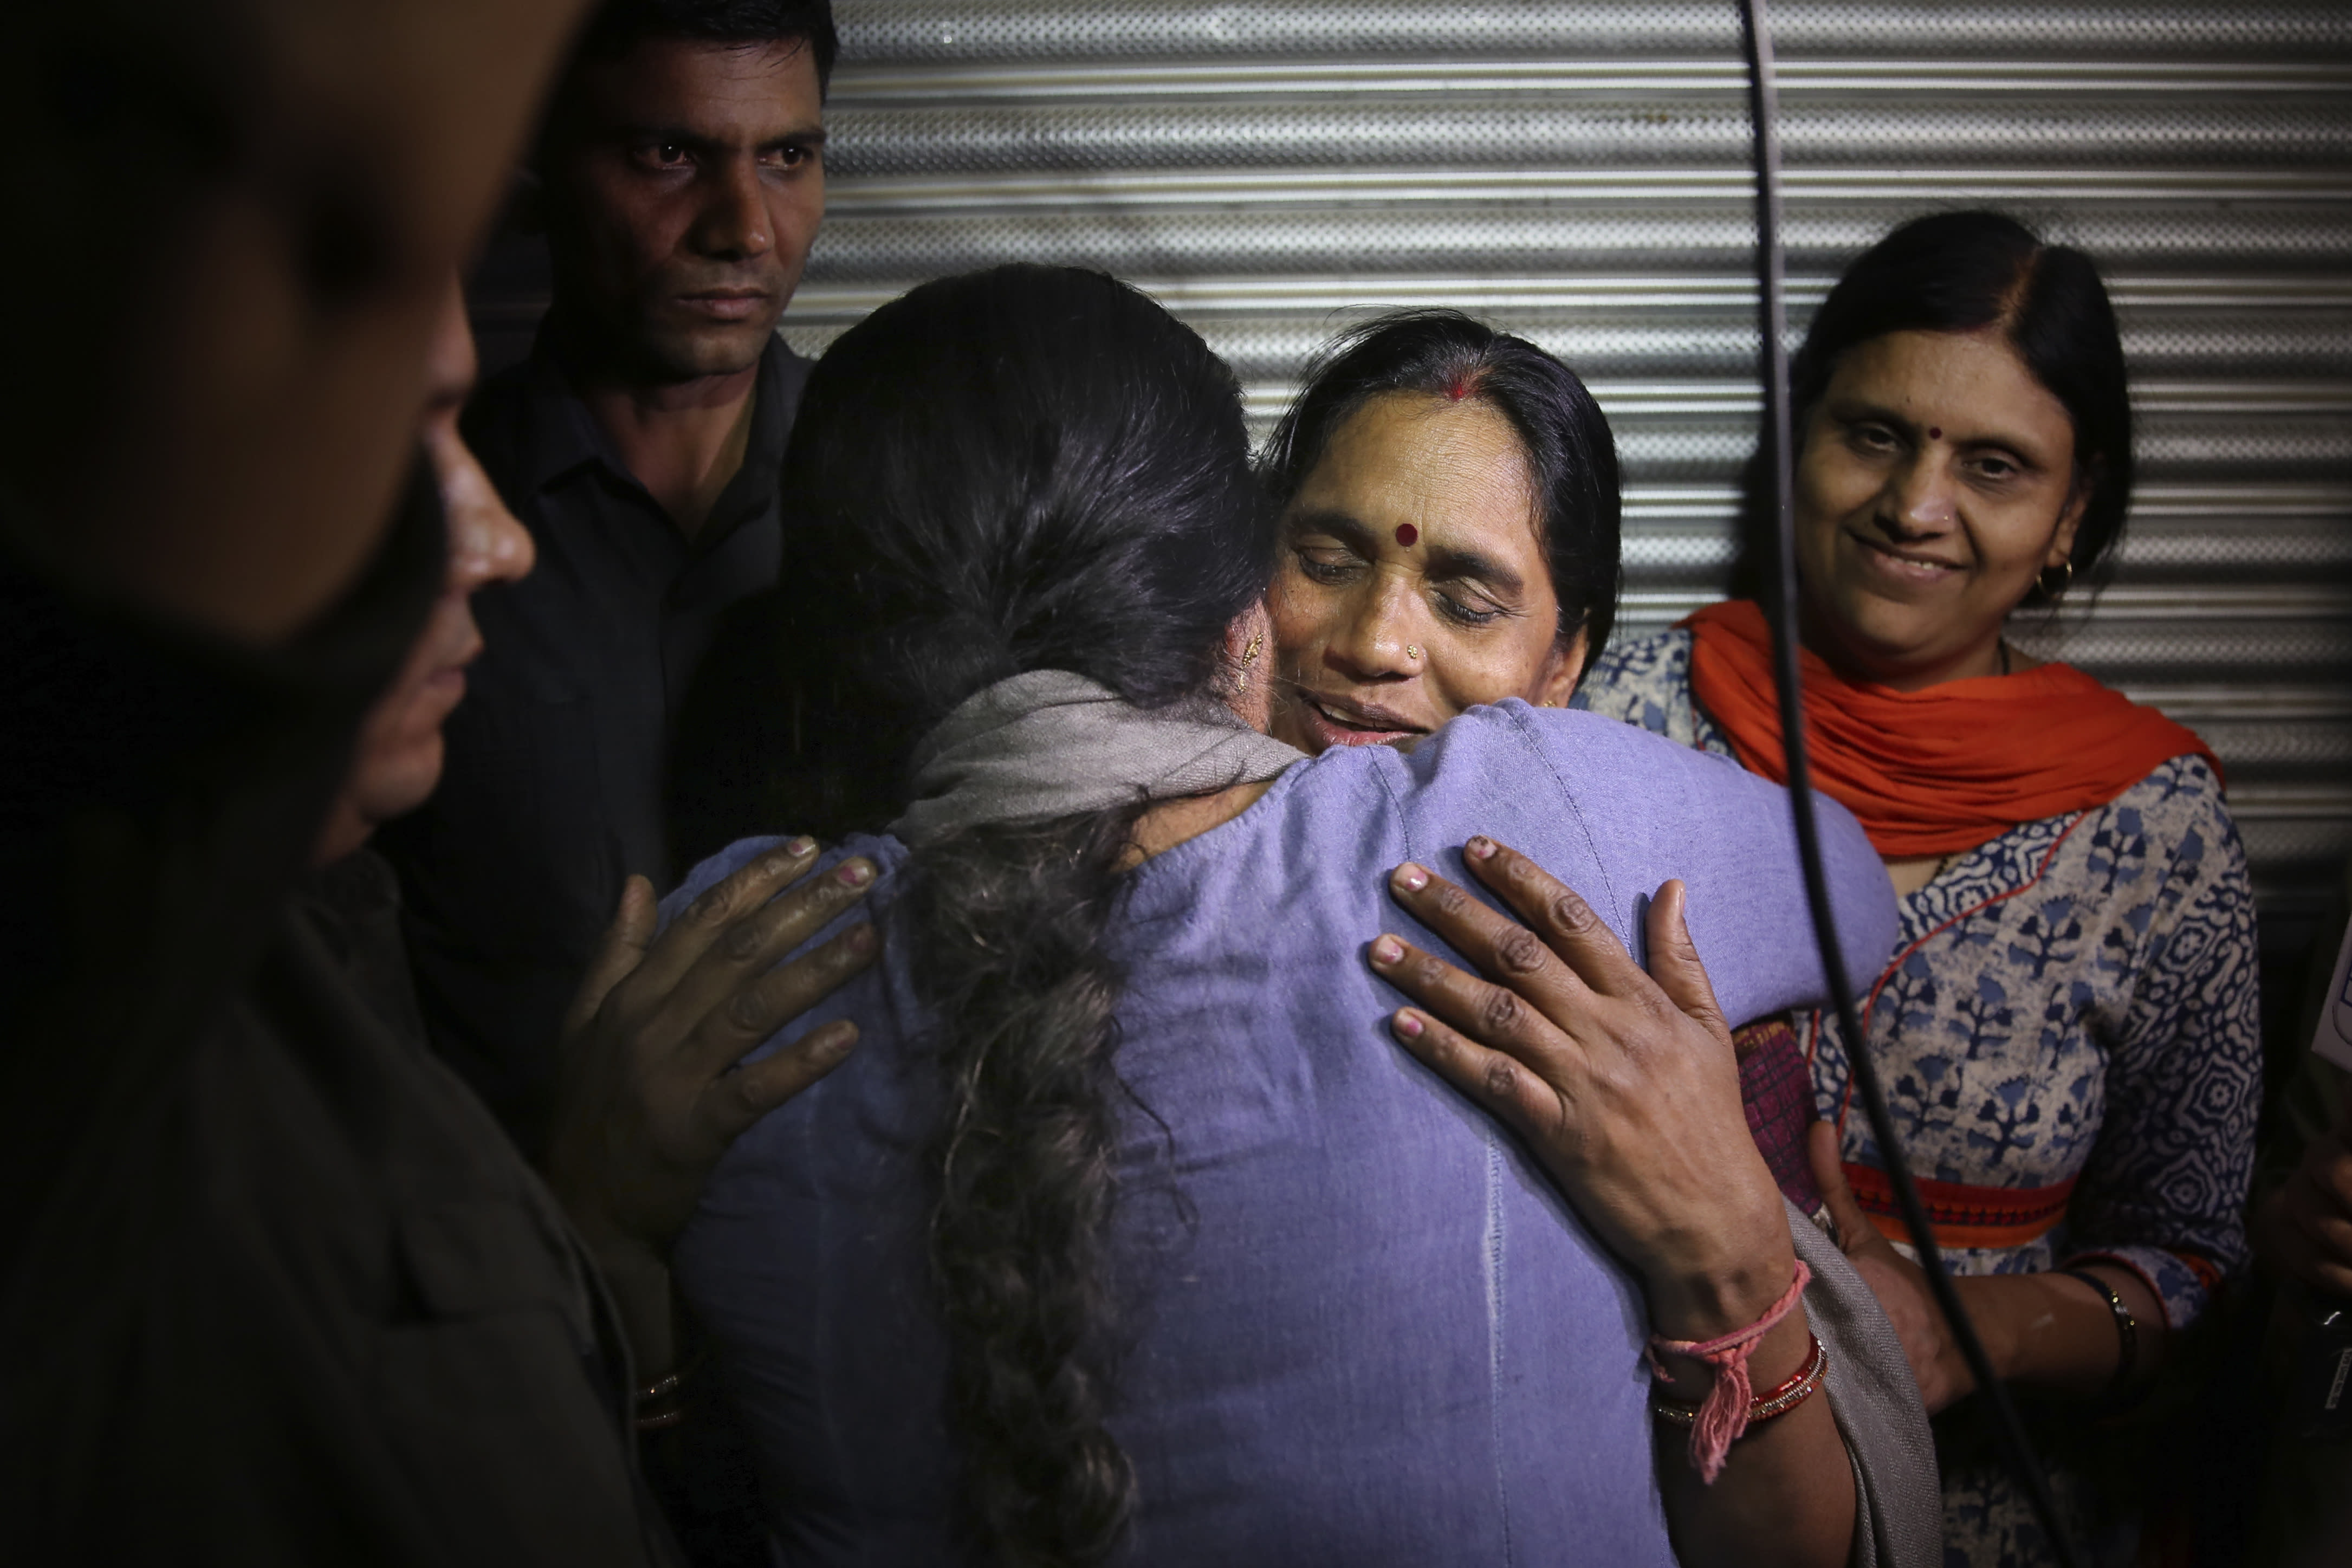 India executes four men convicted over 2012 Delhi bus rape and murder